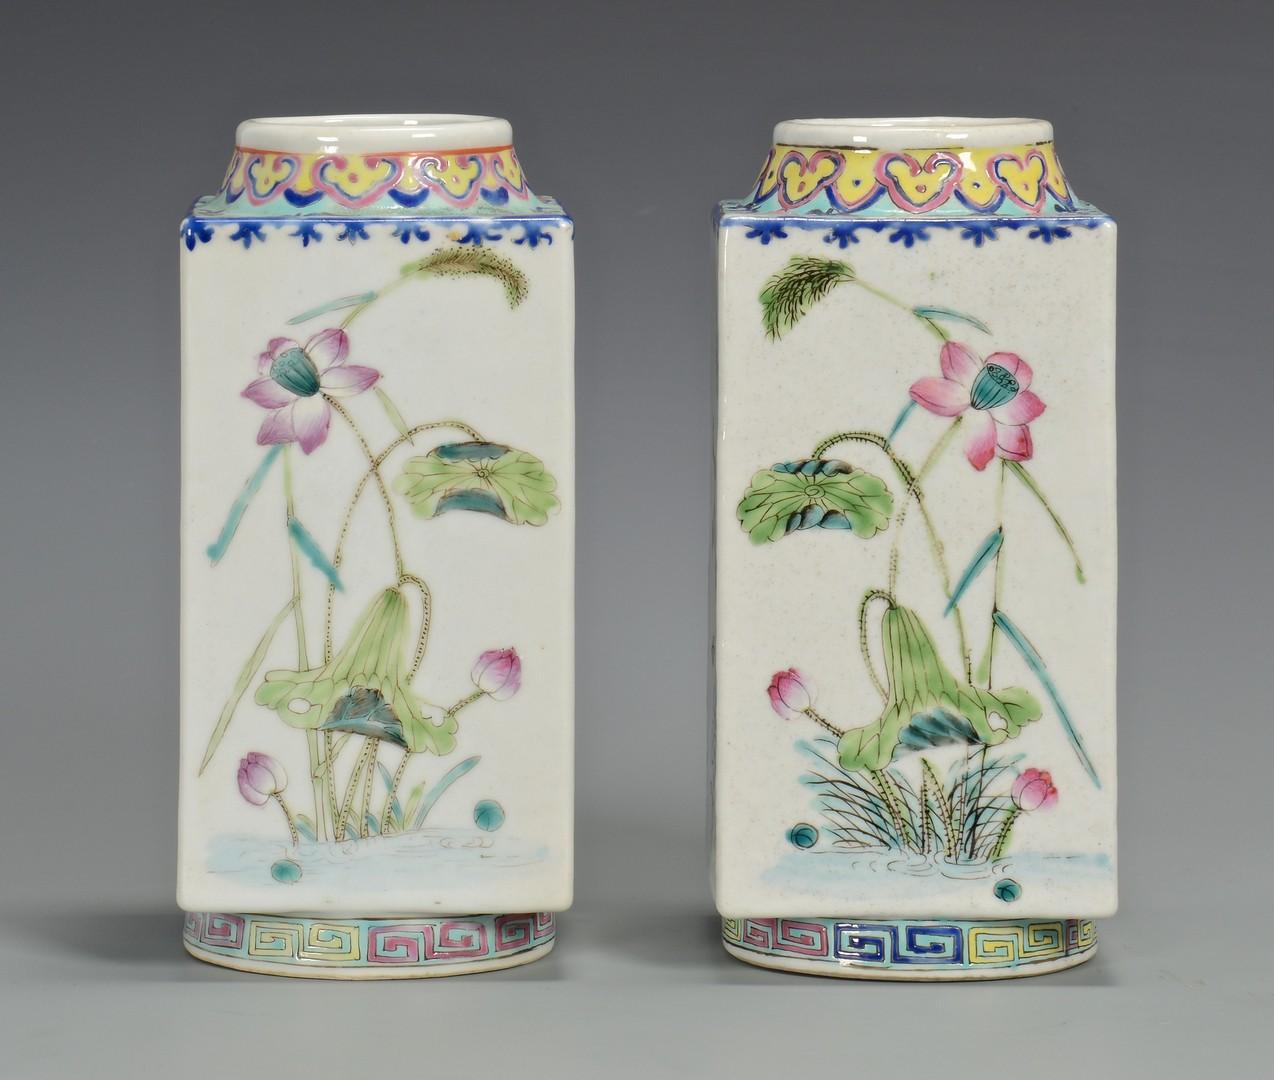 Lot 357: Pr. Chinese Famille Rose Square Vases